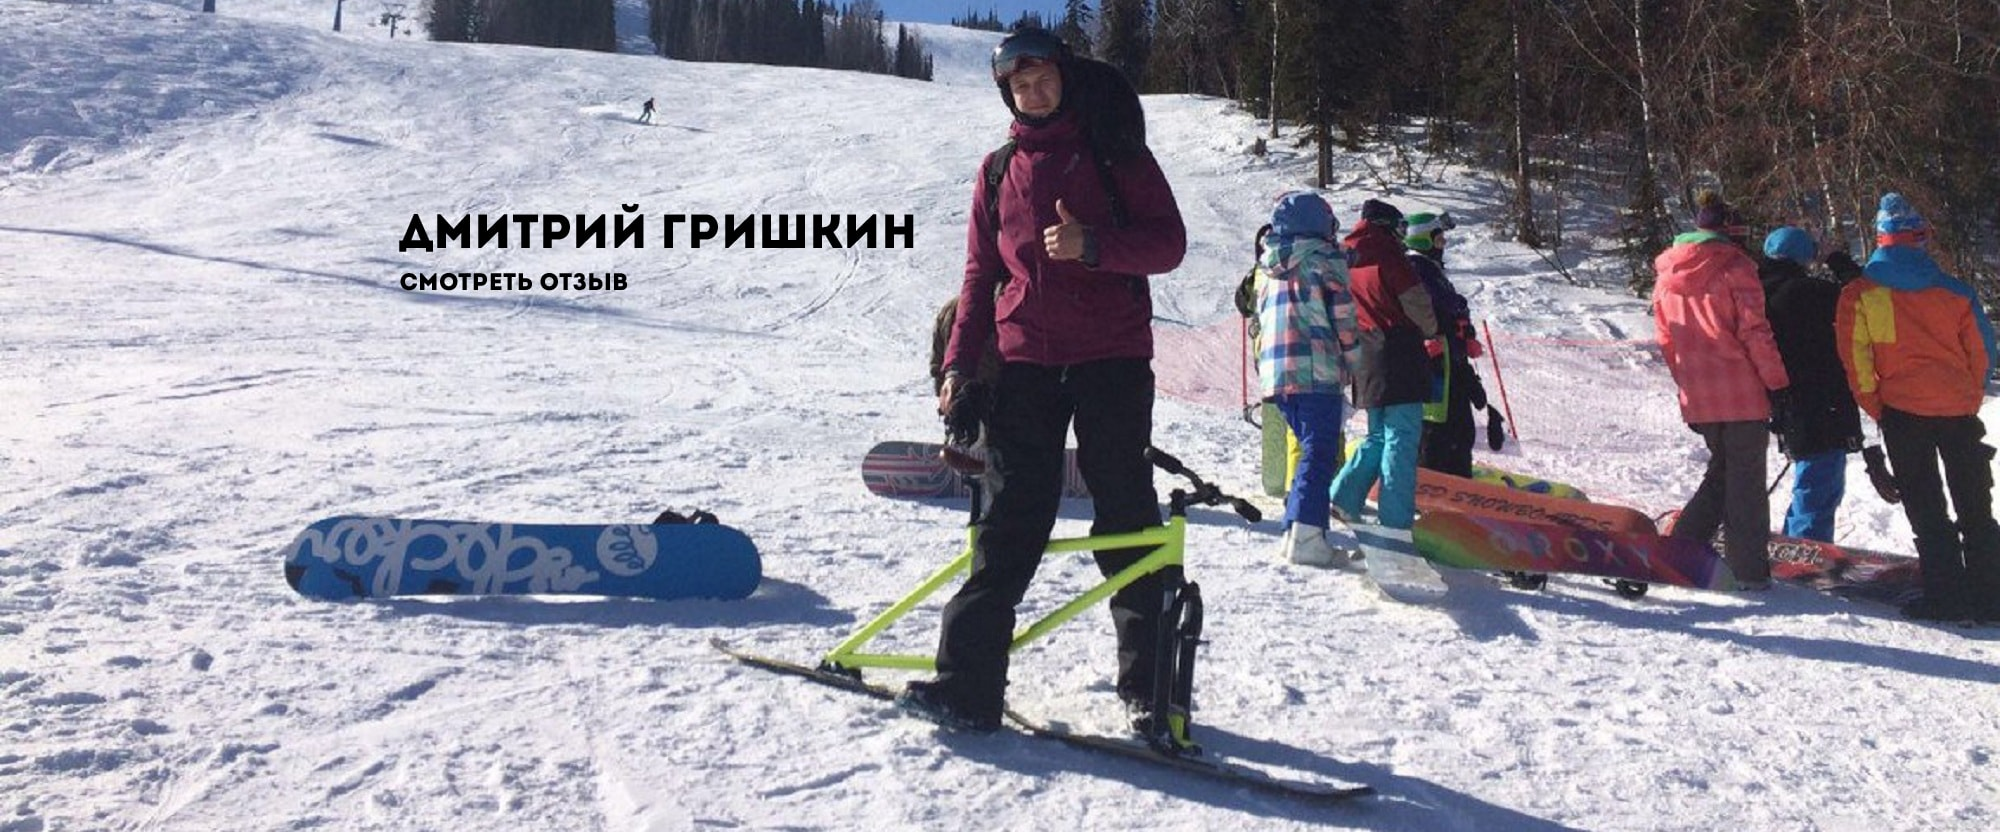 Snowbike-review_1-min